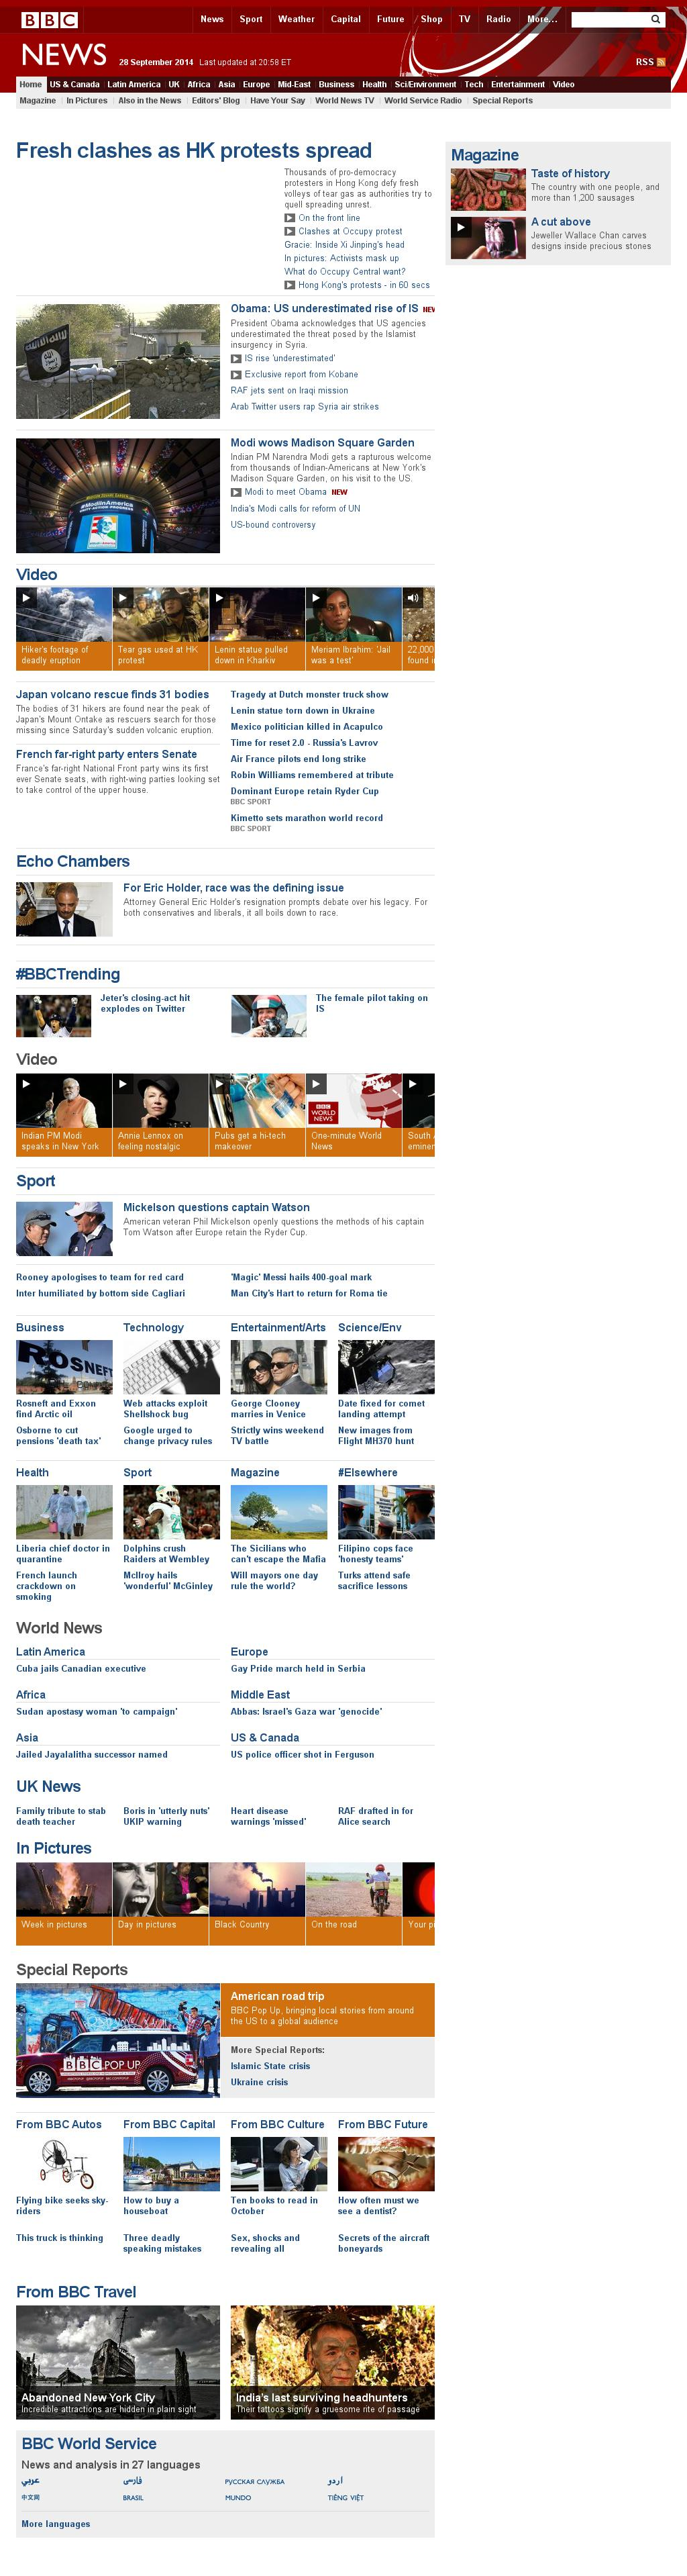 BBC at Monday Sept. 29, 2014, 1 a.m. UTC